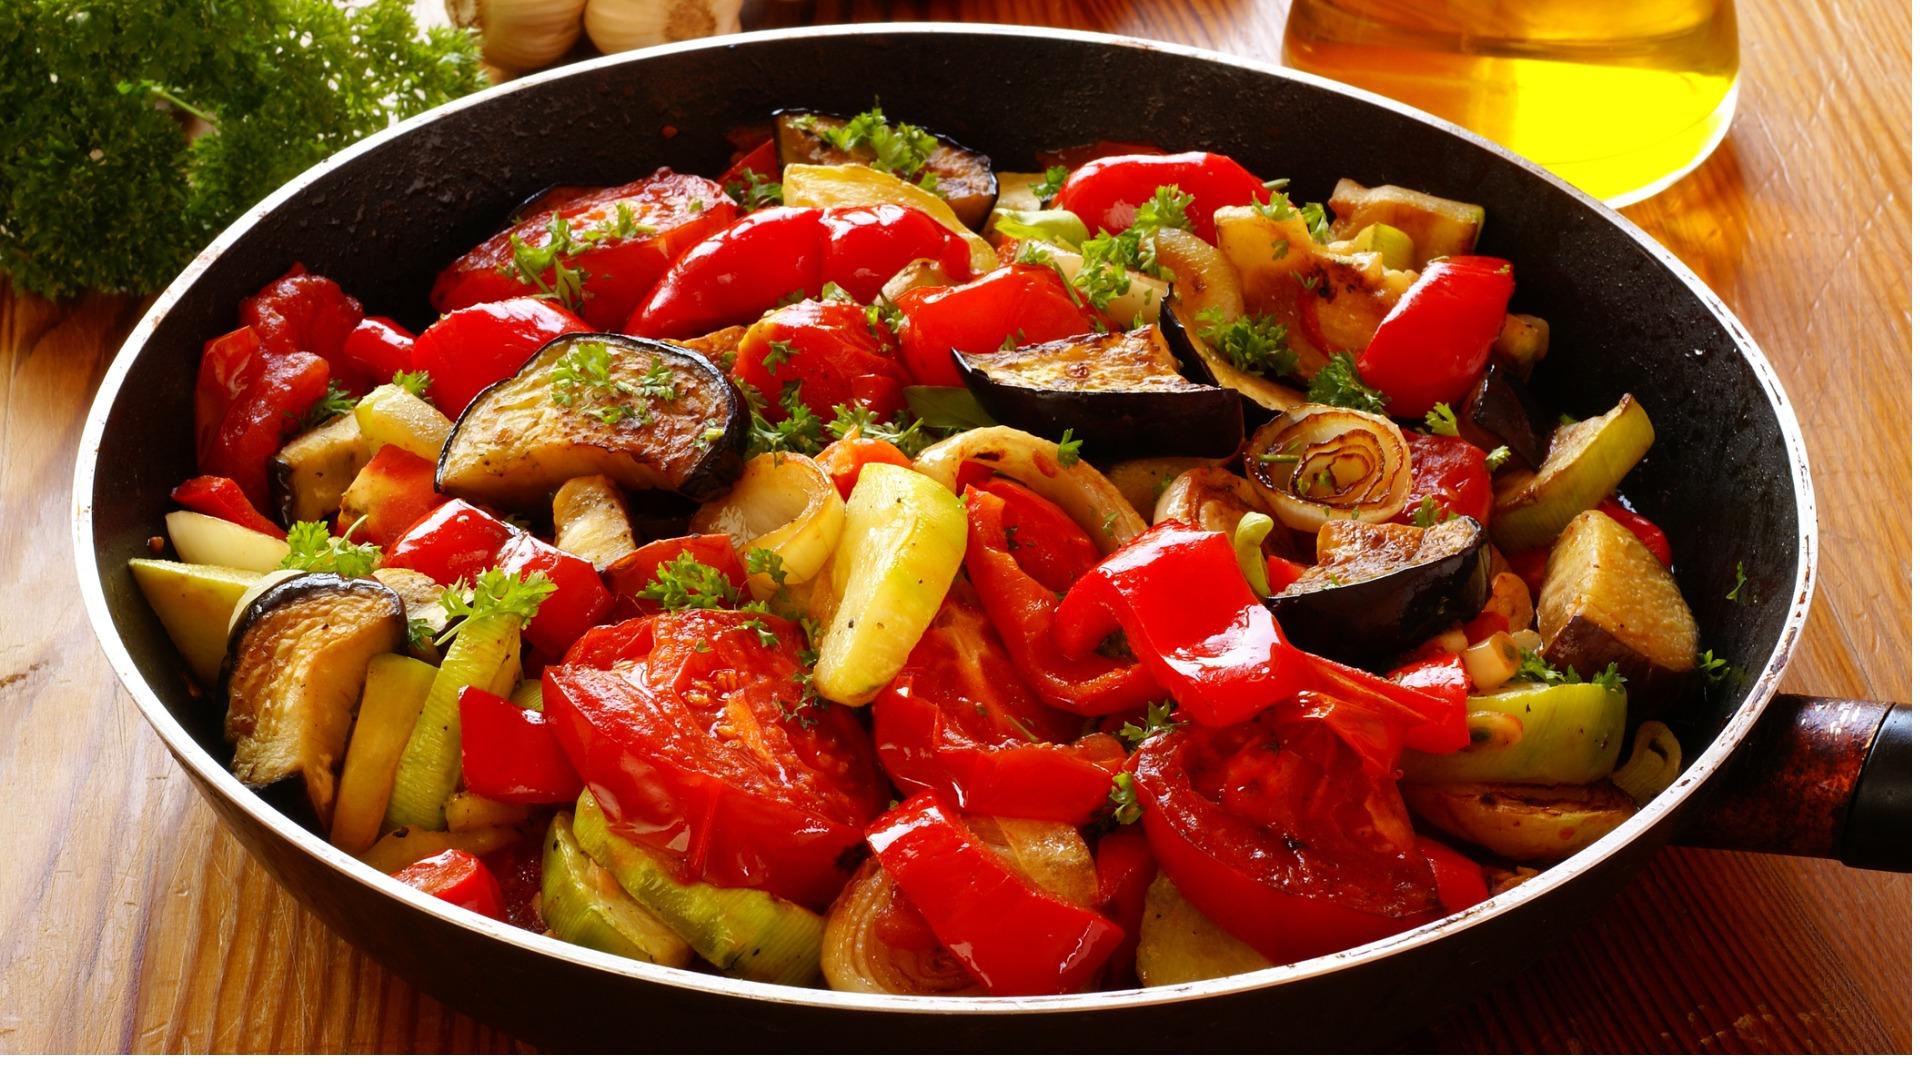 pan of ratatouille